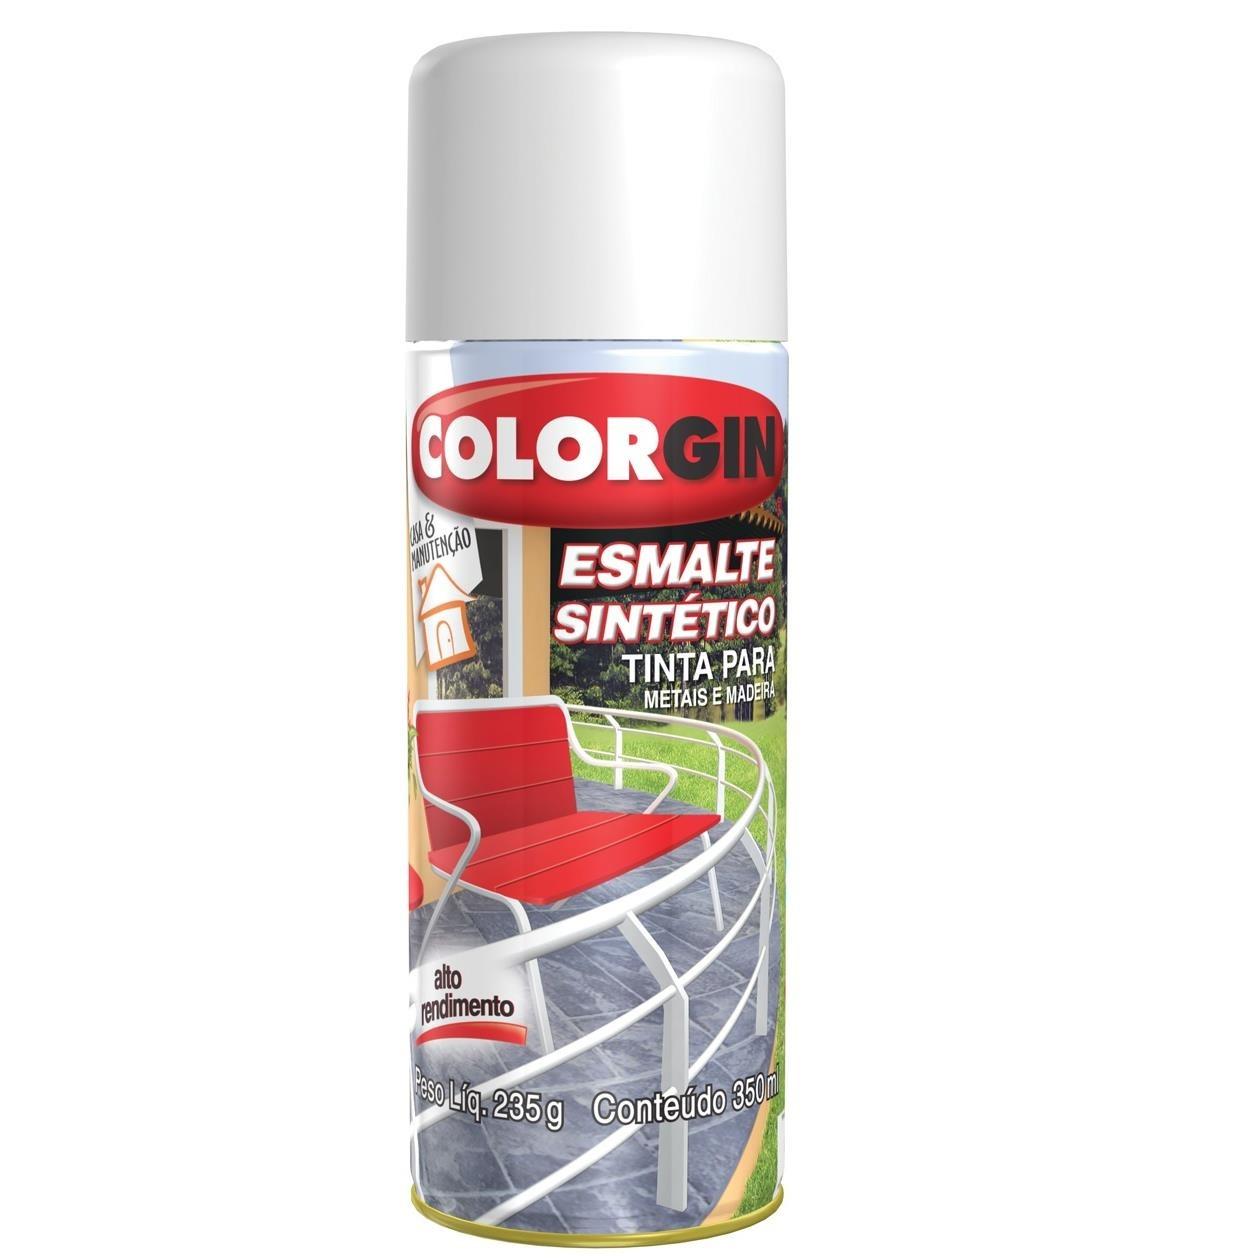 Tinta Spray Brilhante Esmalte sintetico Interno e Externo - Vermelho - 350ml - Colorgin